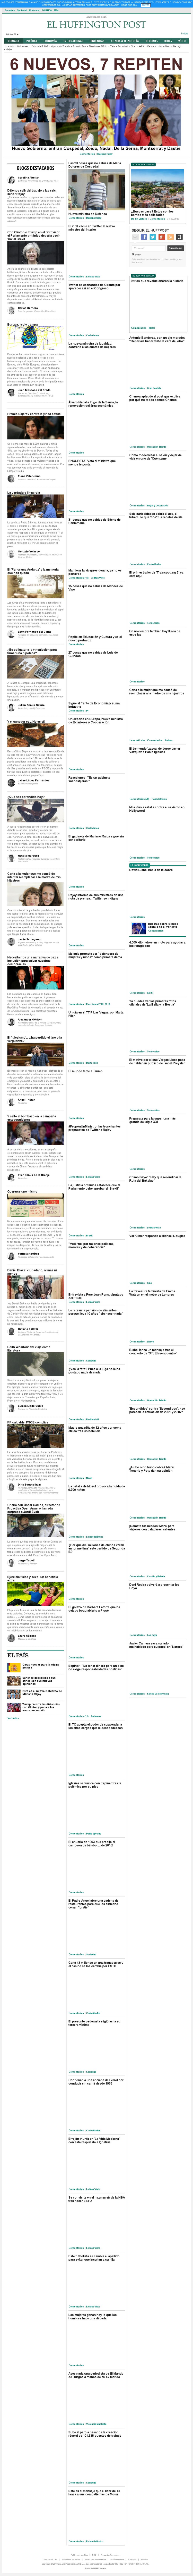 El Huffington Post (Spain) at Friday Nov. 4, 2016, 12:07 a.m. UTC